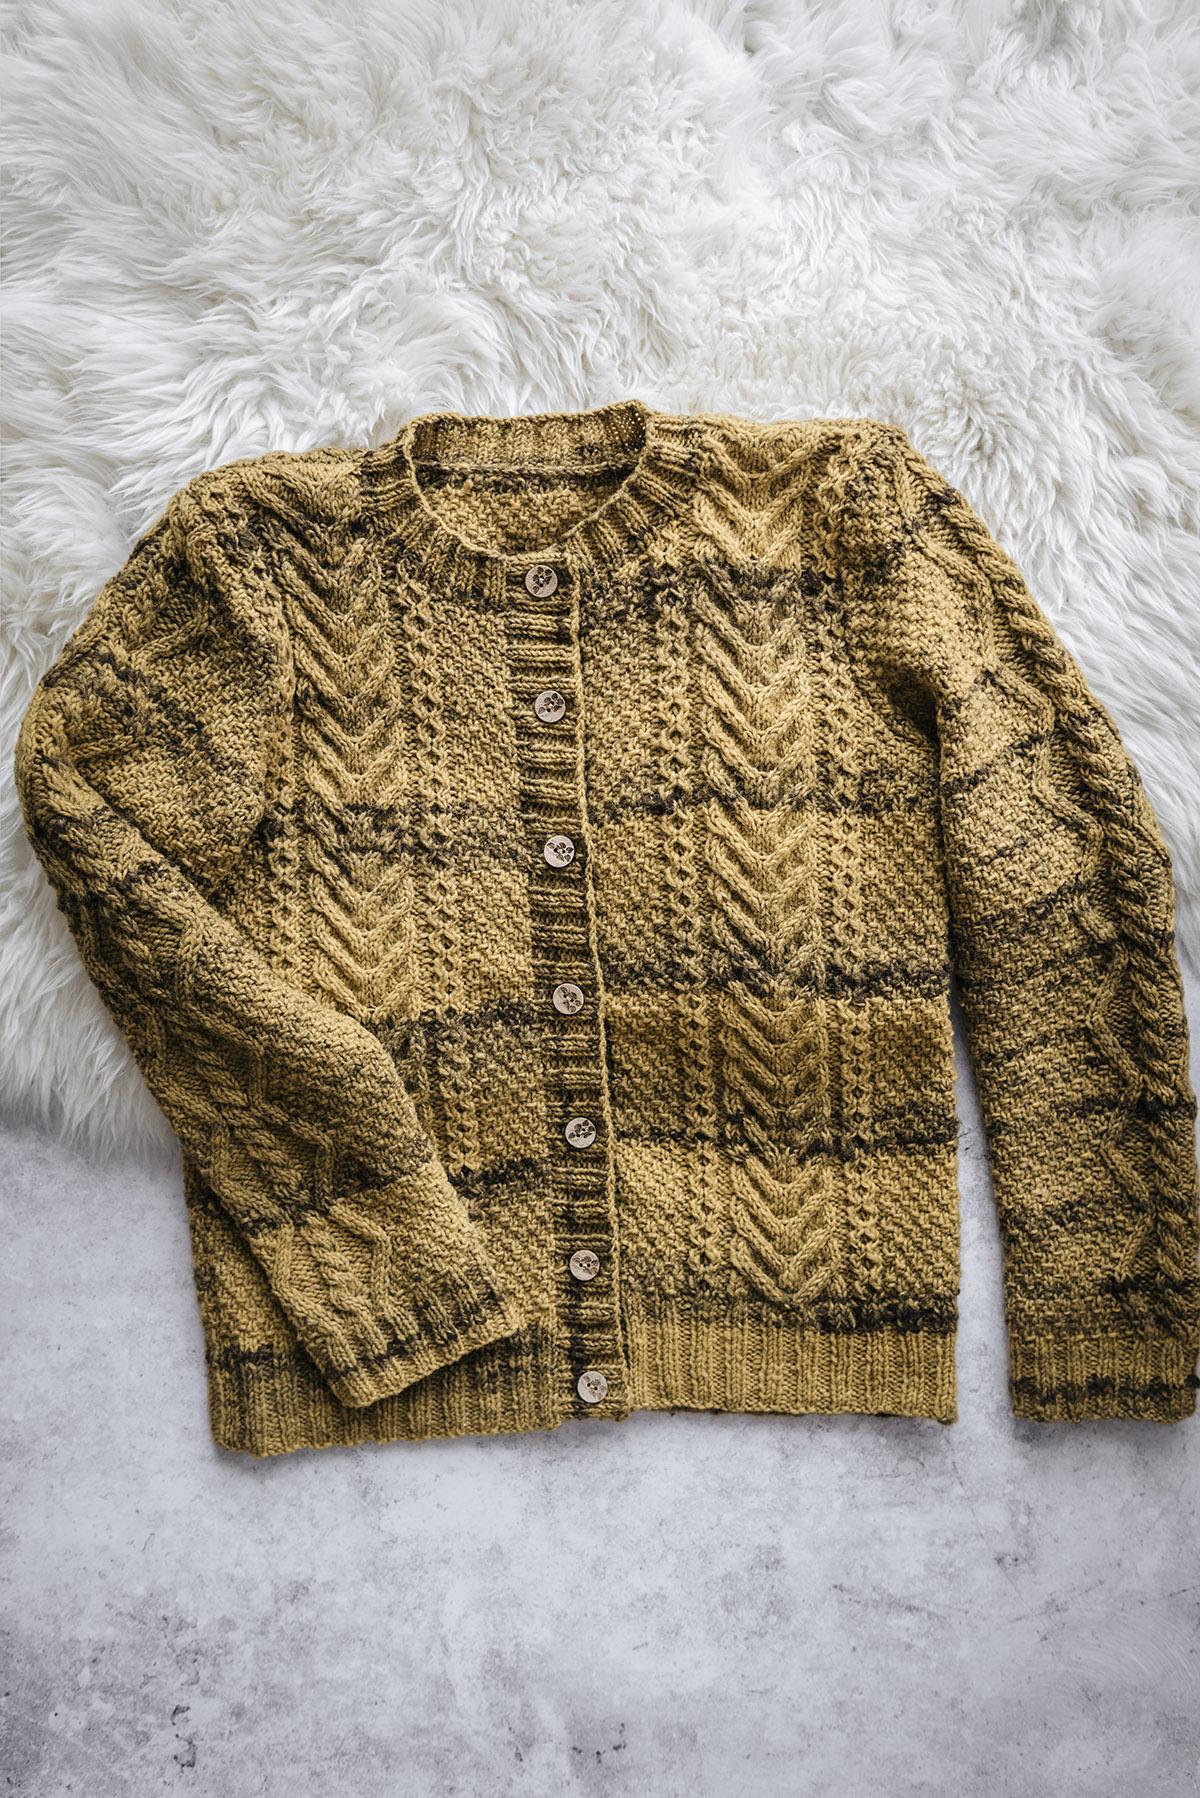 Aran Cardigan Yoko Hatta pattern Knitted with Beiroa Portuguese wool.jpg